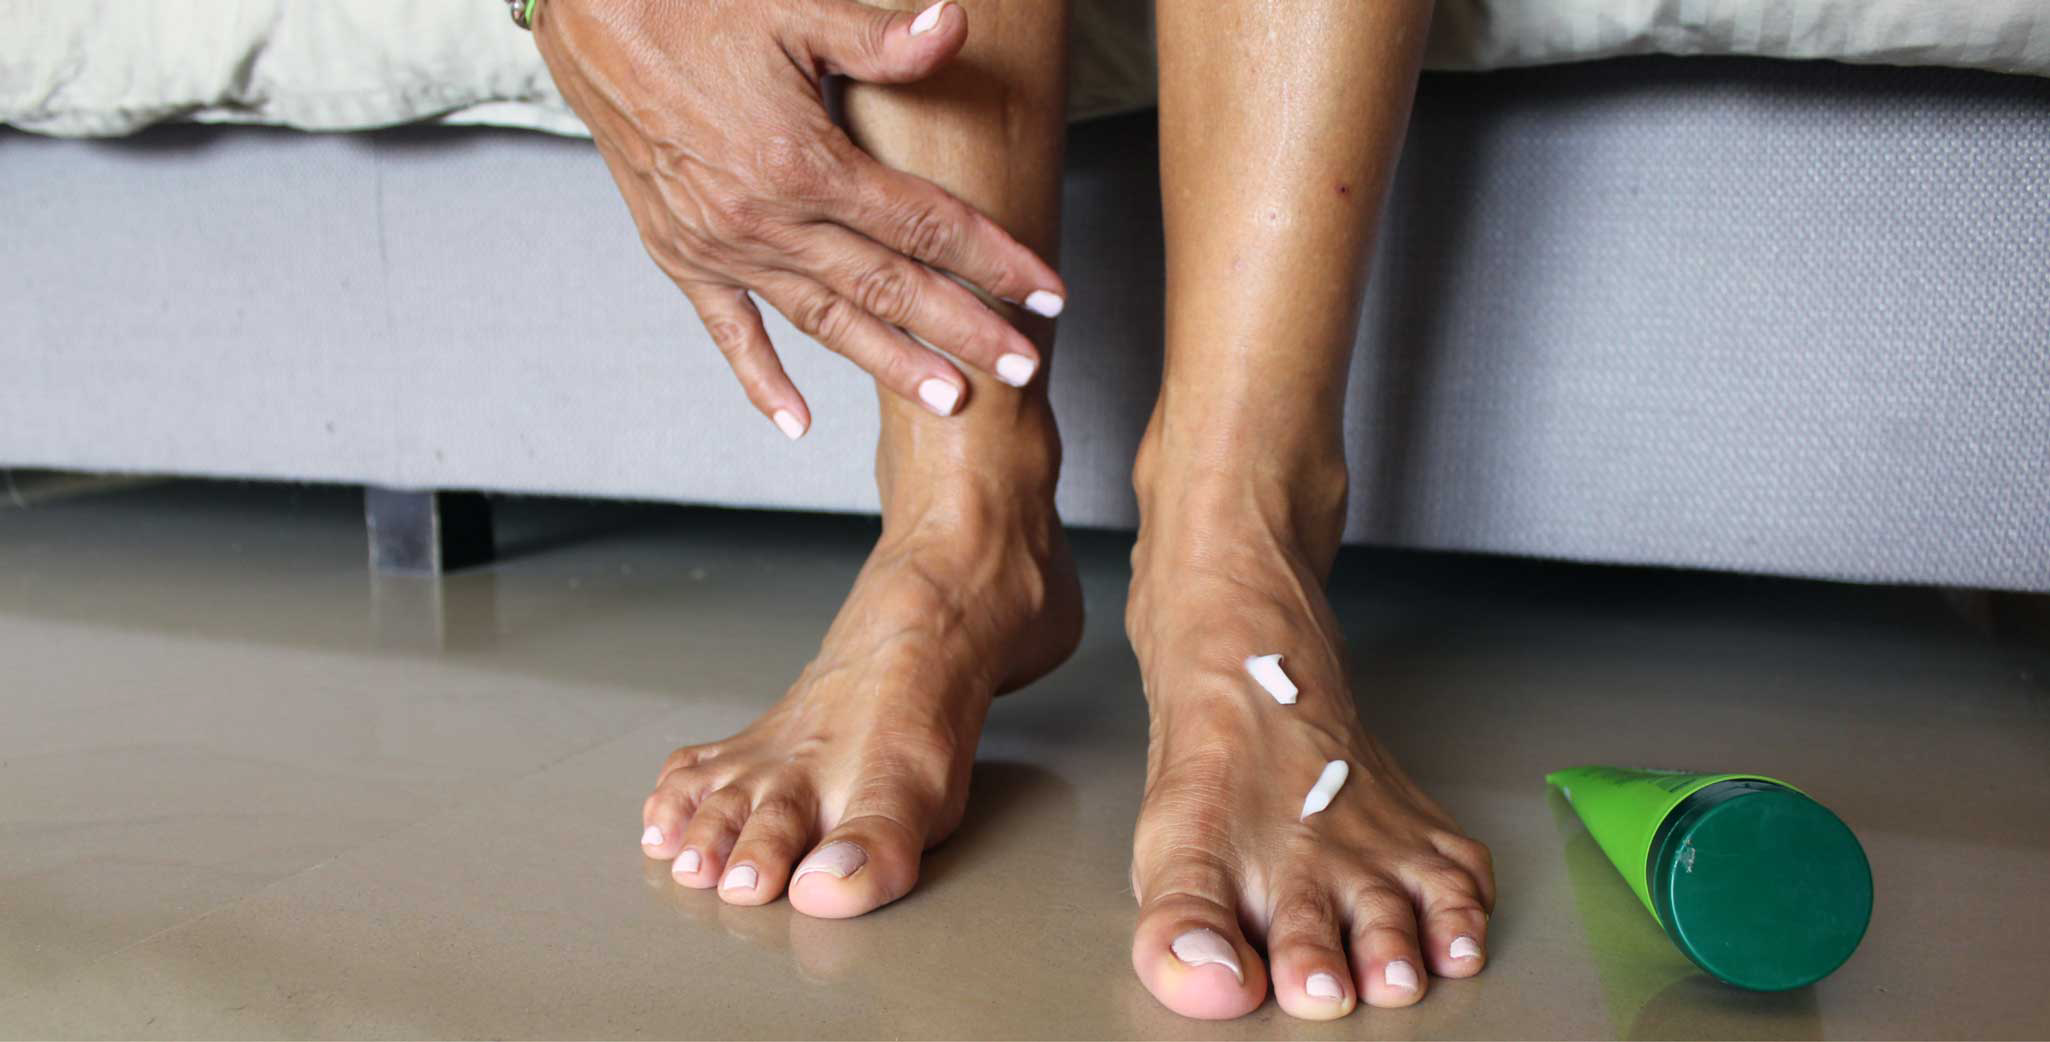 Moisturizing feet